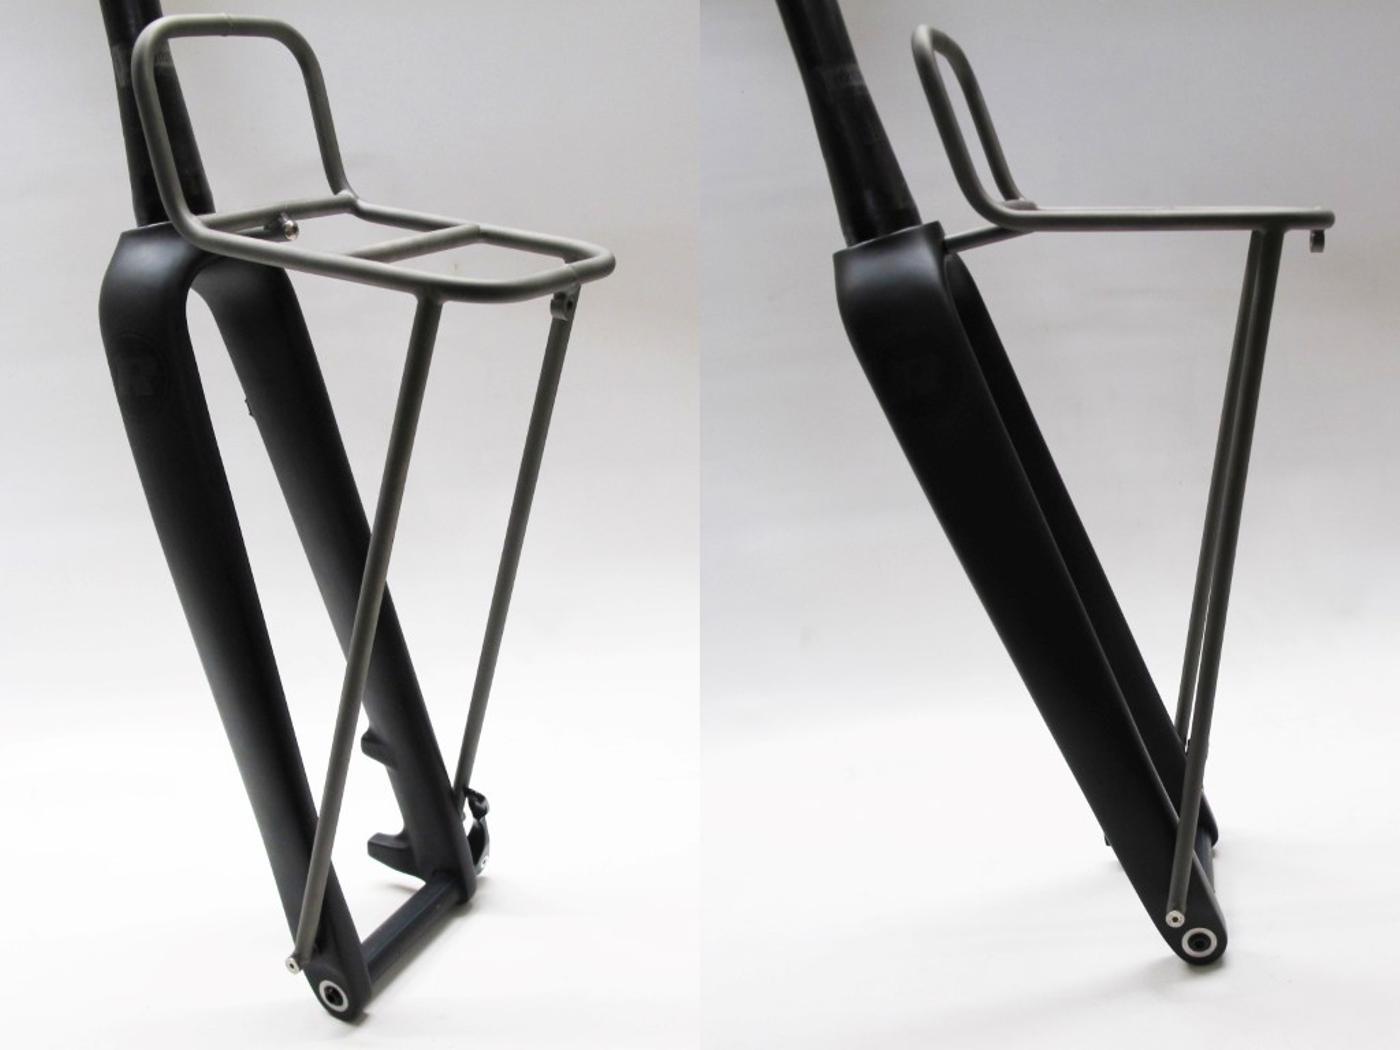 Ren Cycles GX1 Carbon fork with Titanium Rando Rack